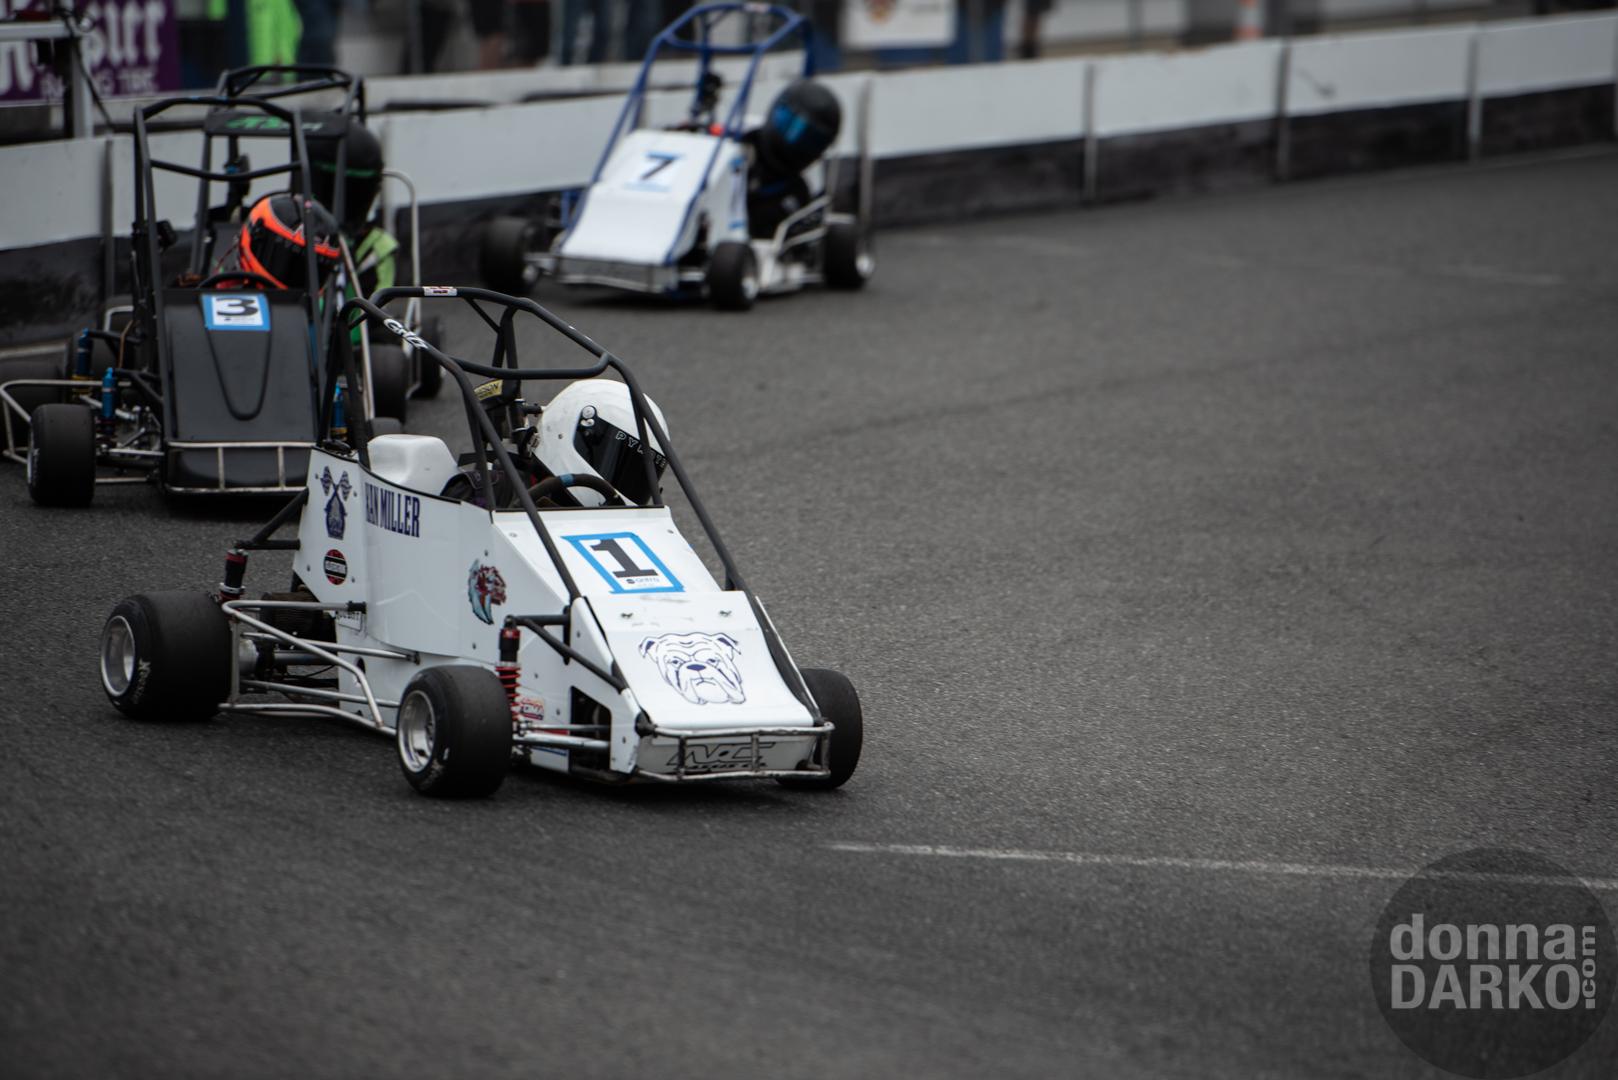 QWMA (Racing) 8-11-2019 DSC_6407.jpg